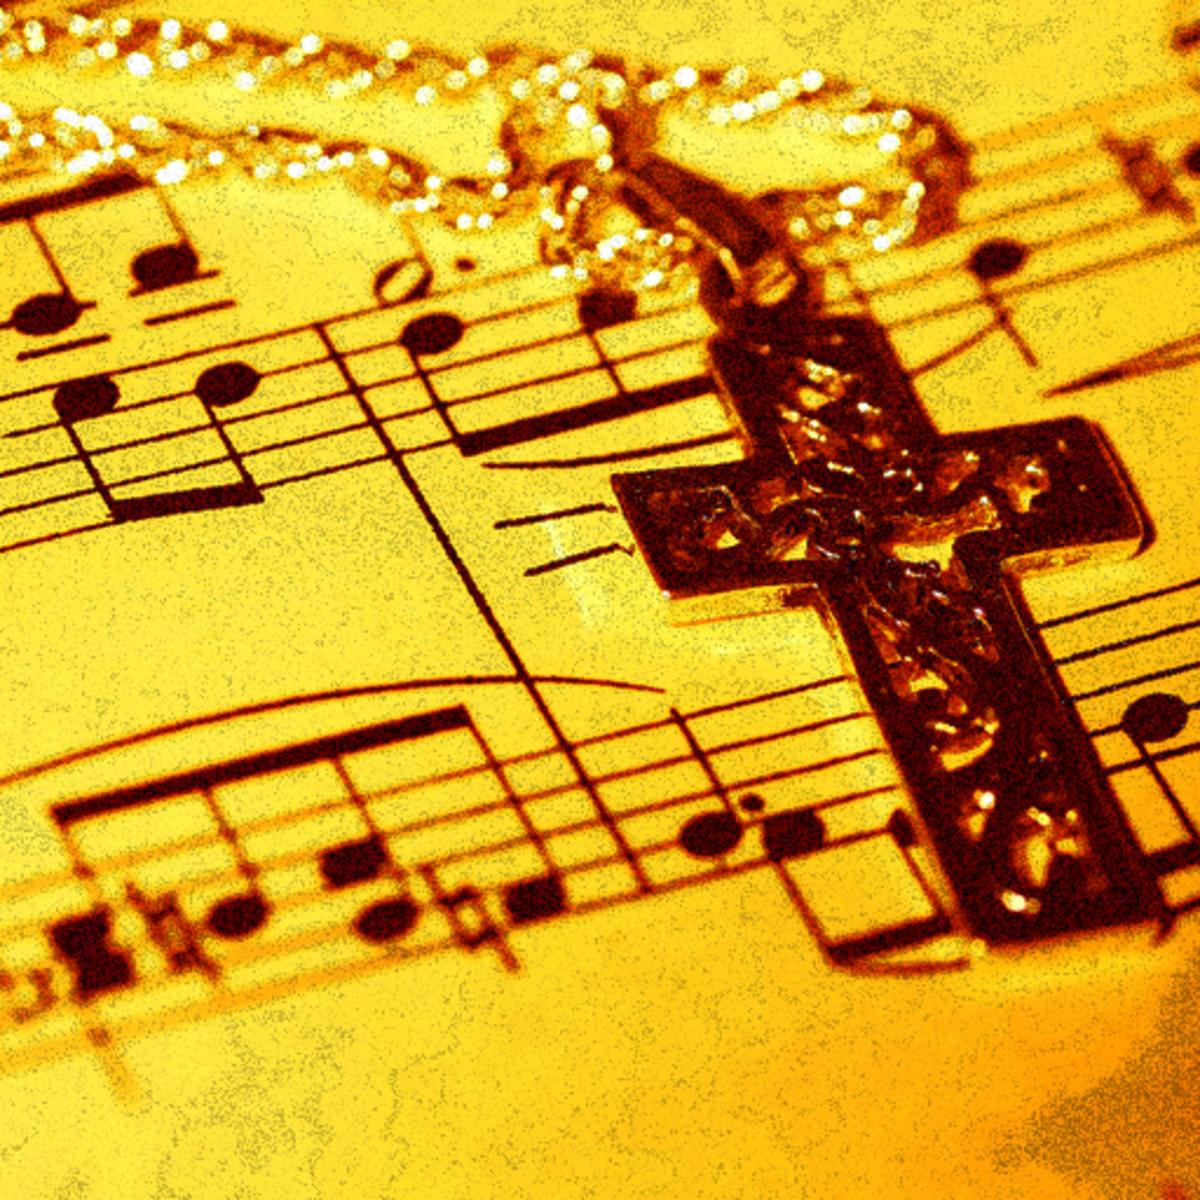 A cross lying on sheet music